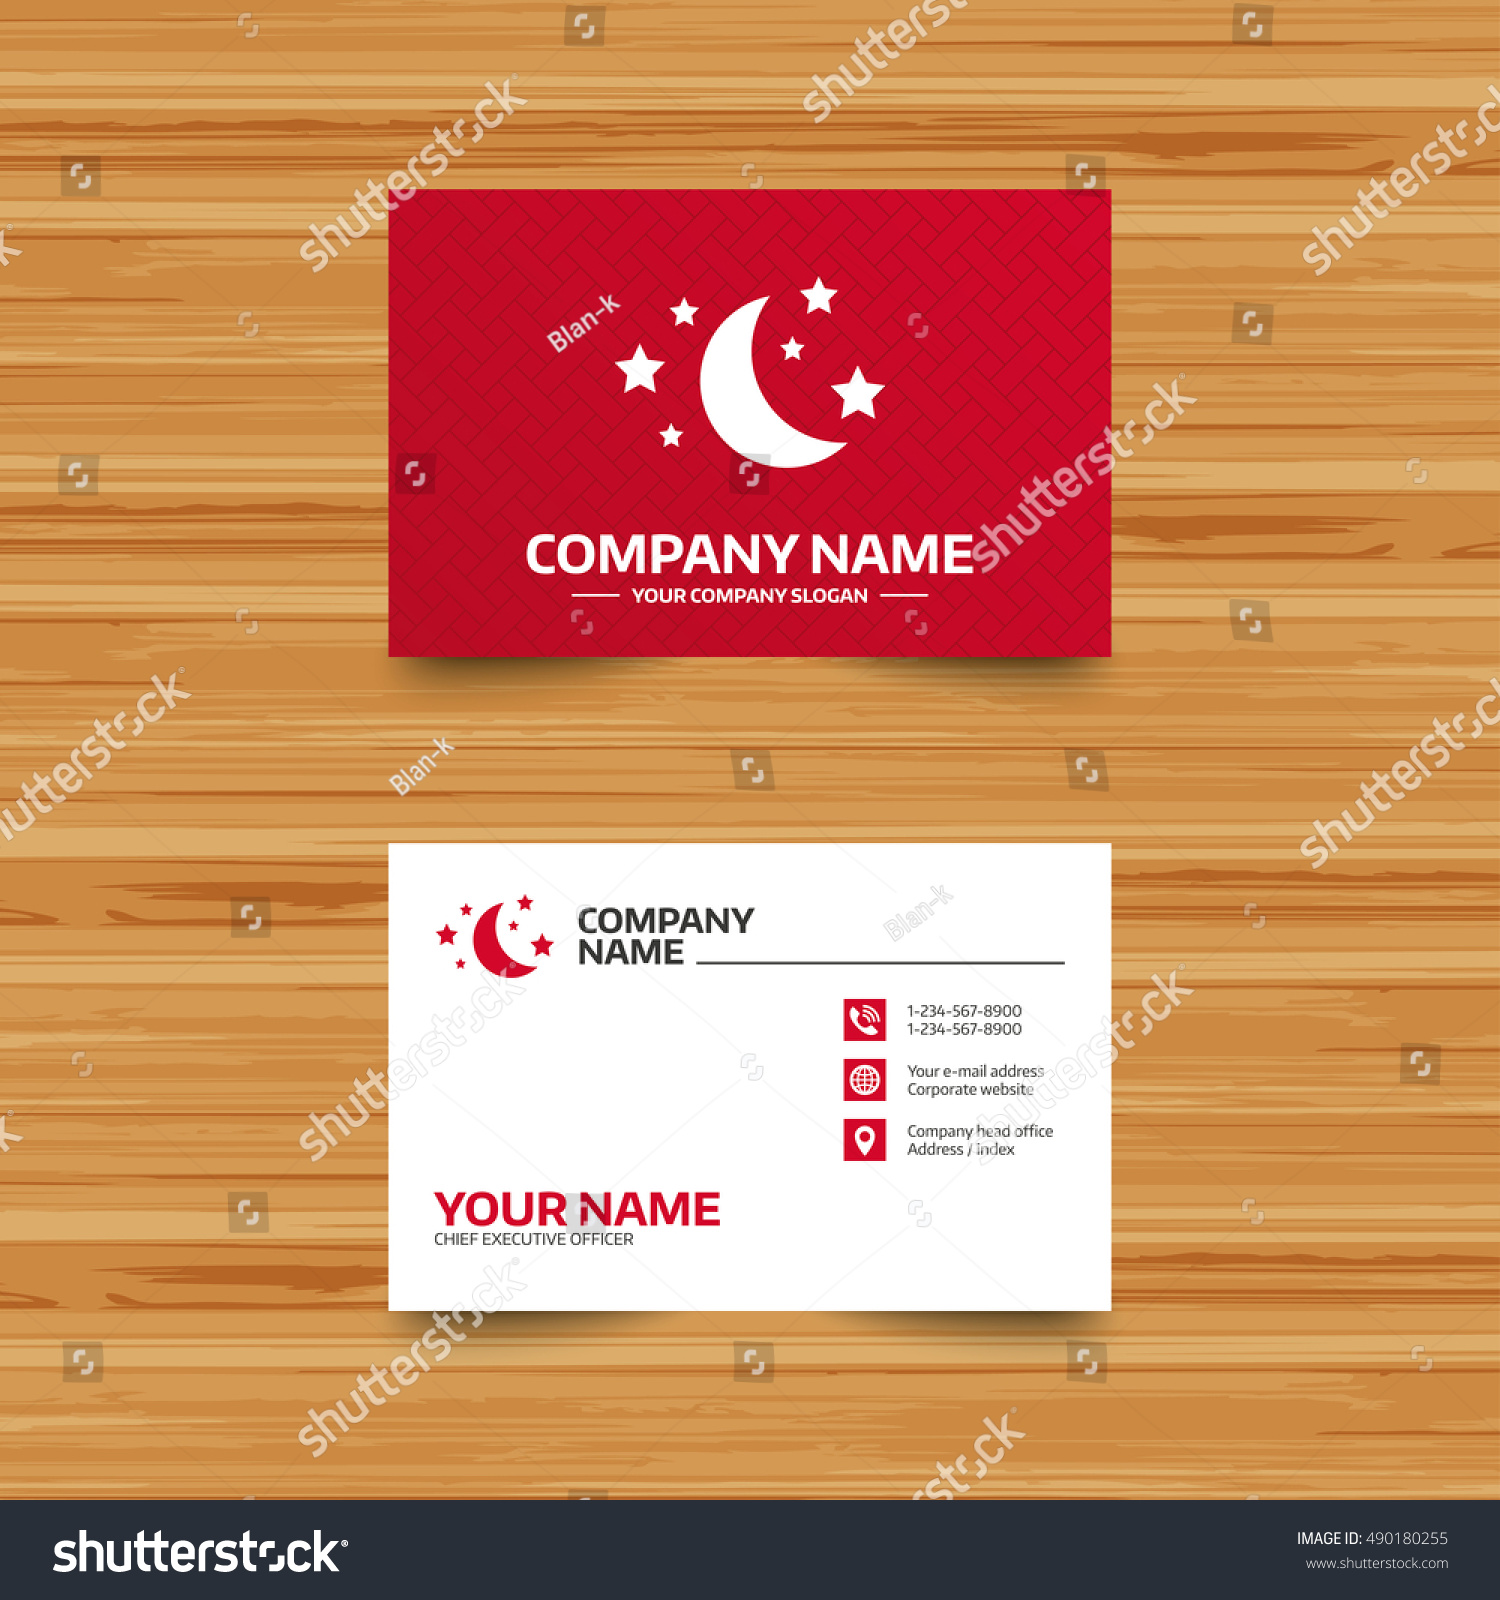 Business card template moon stars icon stock photo photo vector business card template moon and stars icon sleep dreams symbol night or bed colourmoves